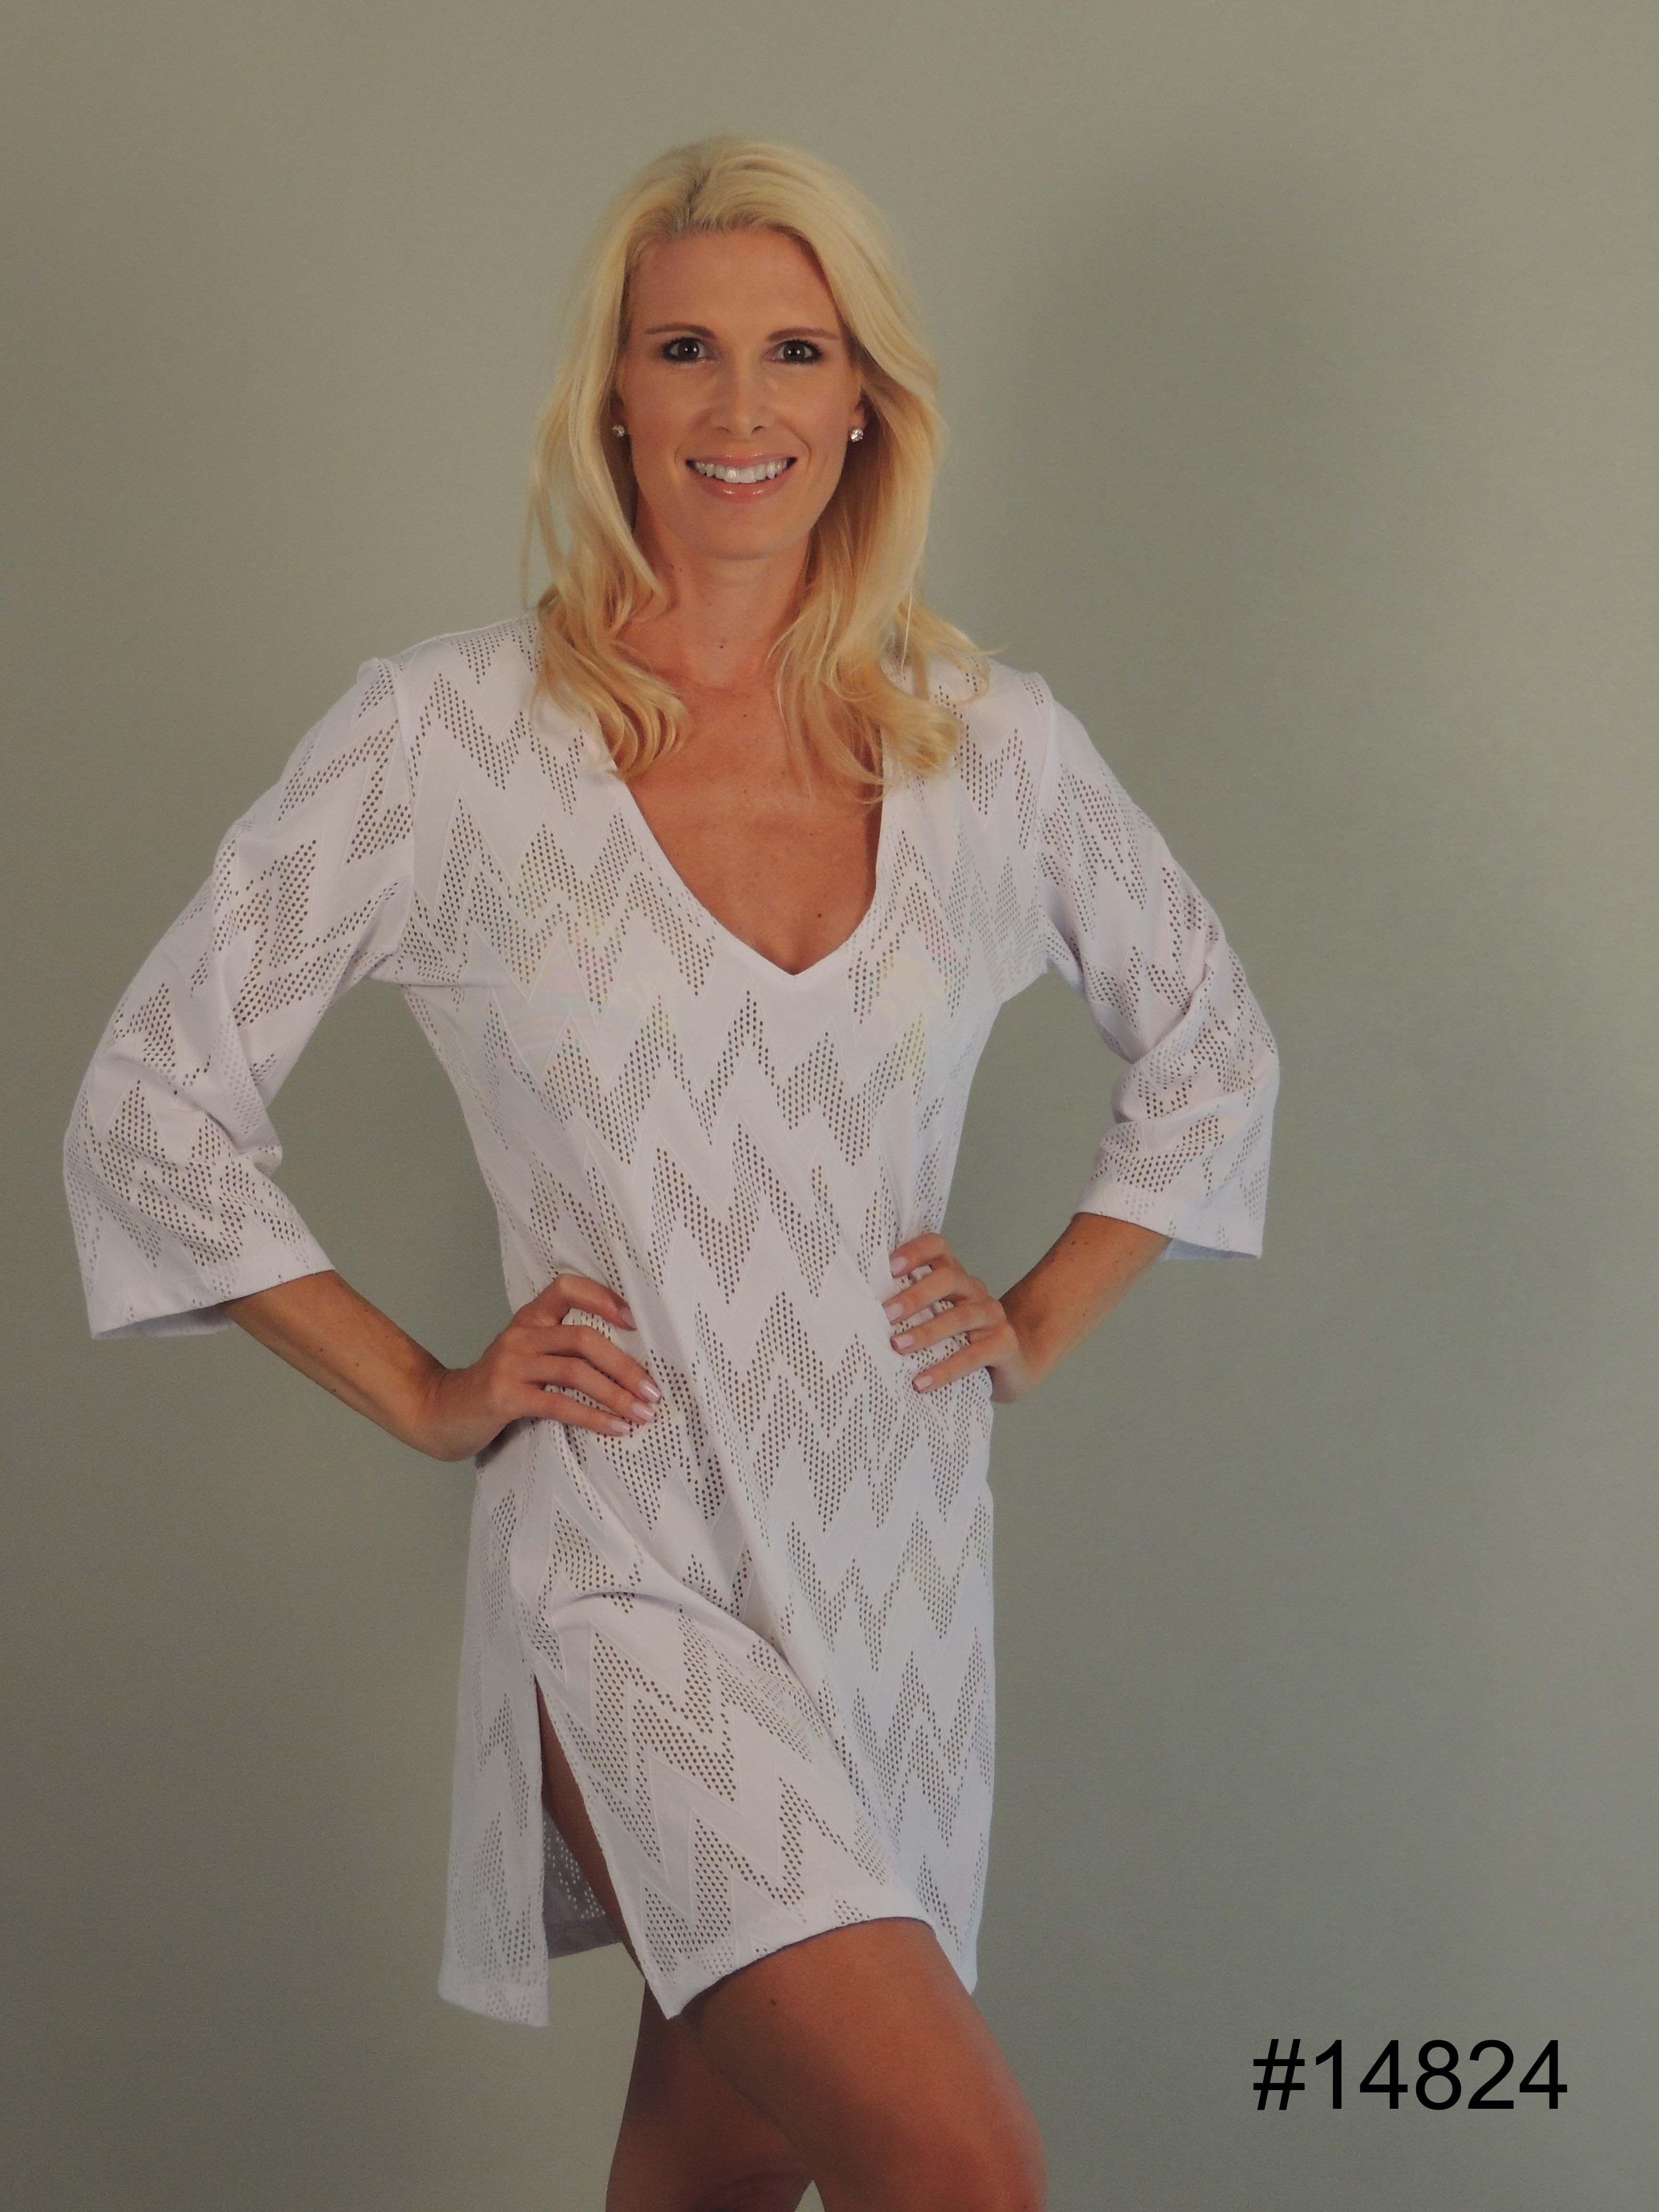 6d5f26f81e J. Valdi 3/4 Length Sleeve Tunic Cover Up Dress. Color white.